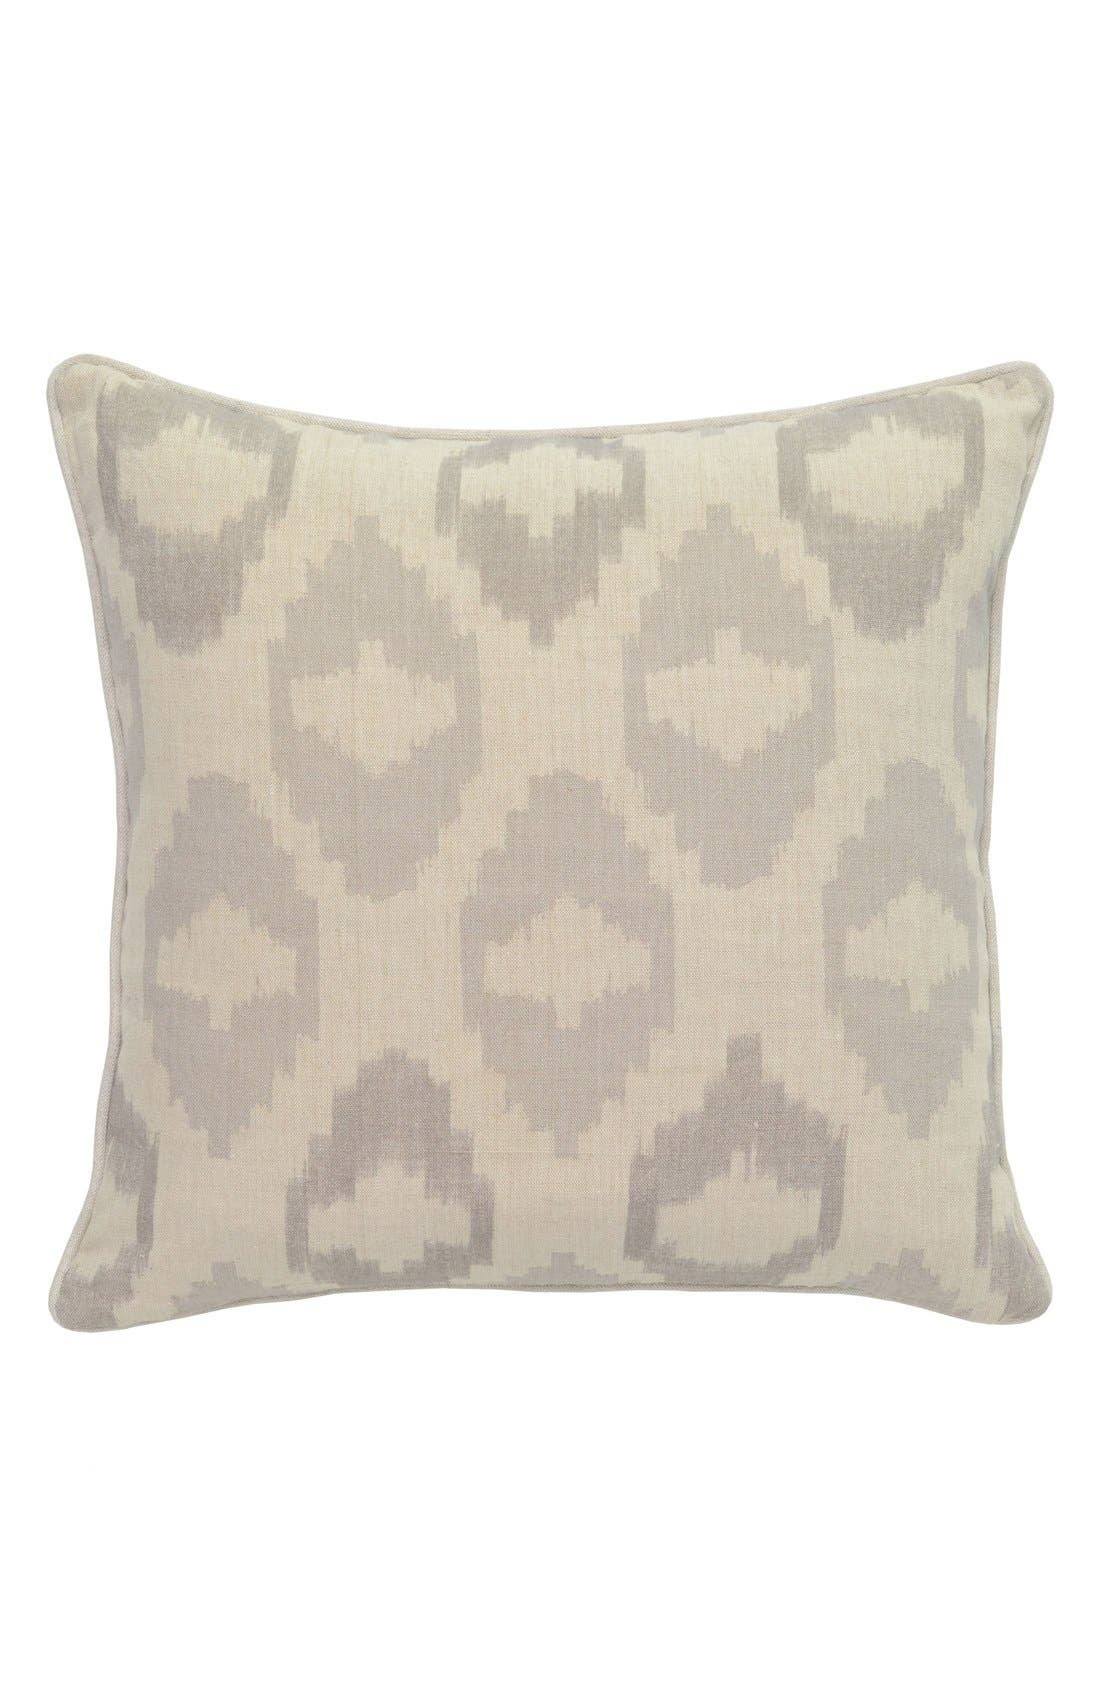 Fae Accent Pillow,                             Alternate thumbnail 2, color,                             BEIGE/ GREY